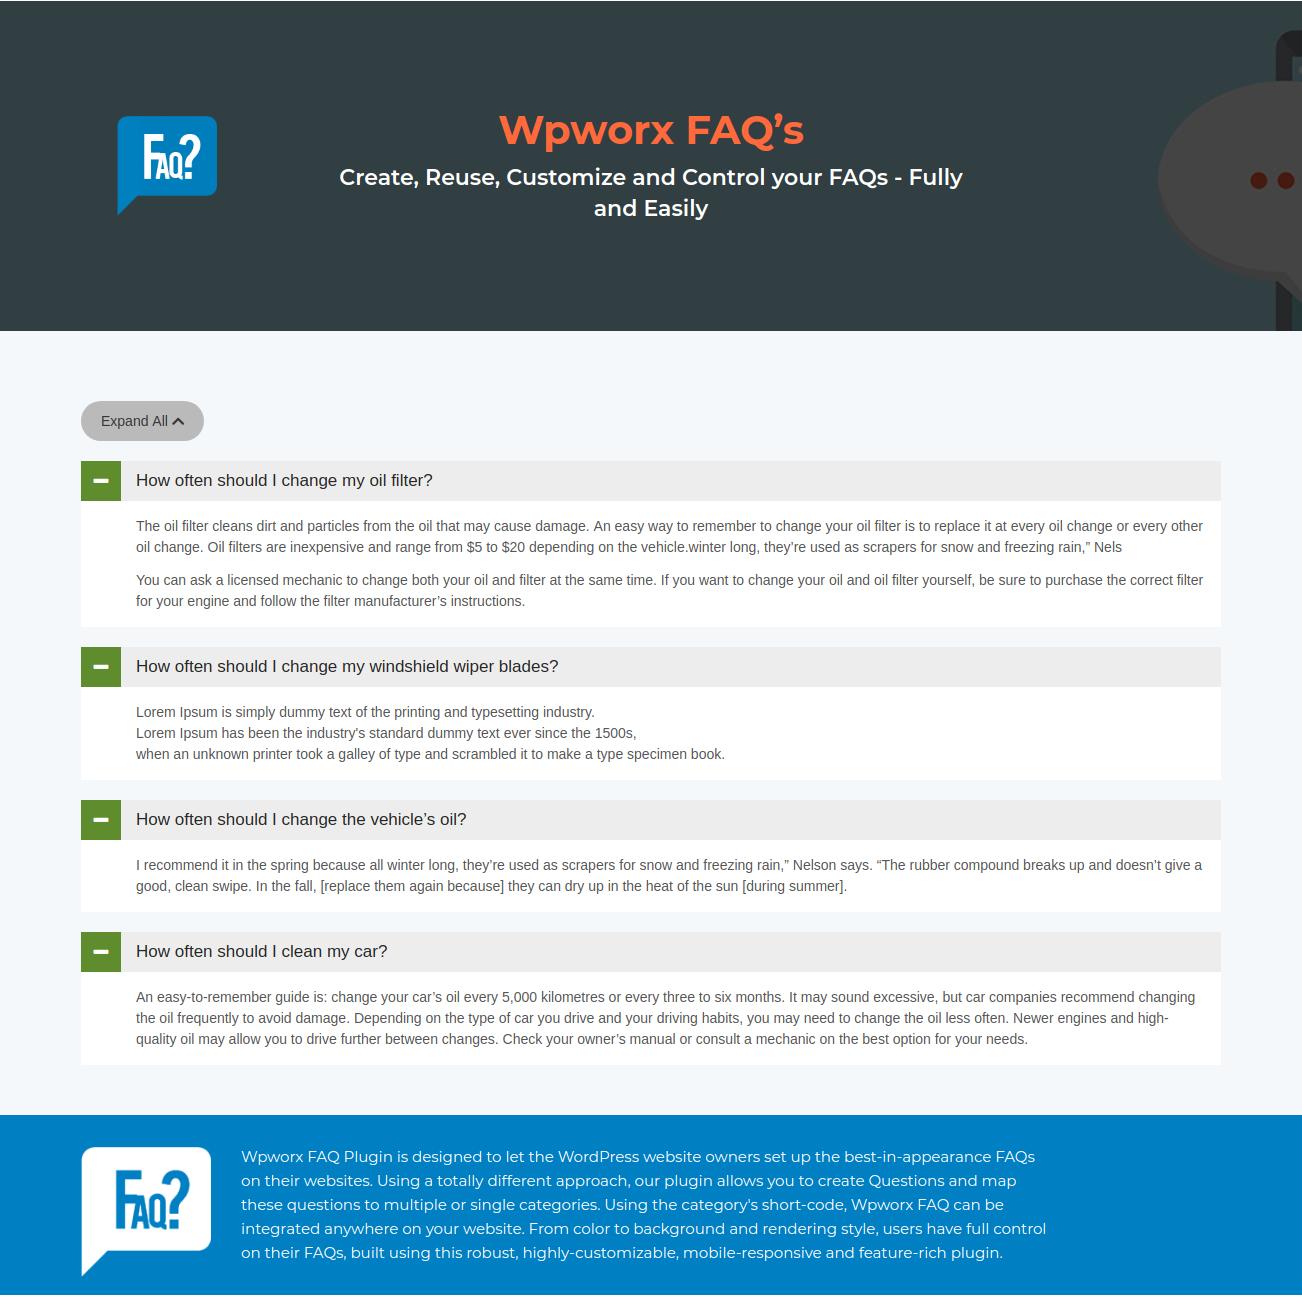 FAQ display expand style